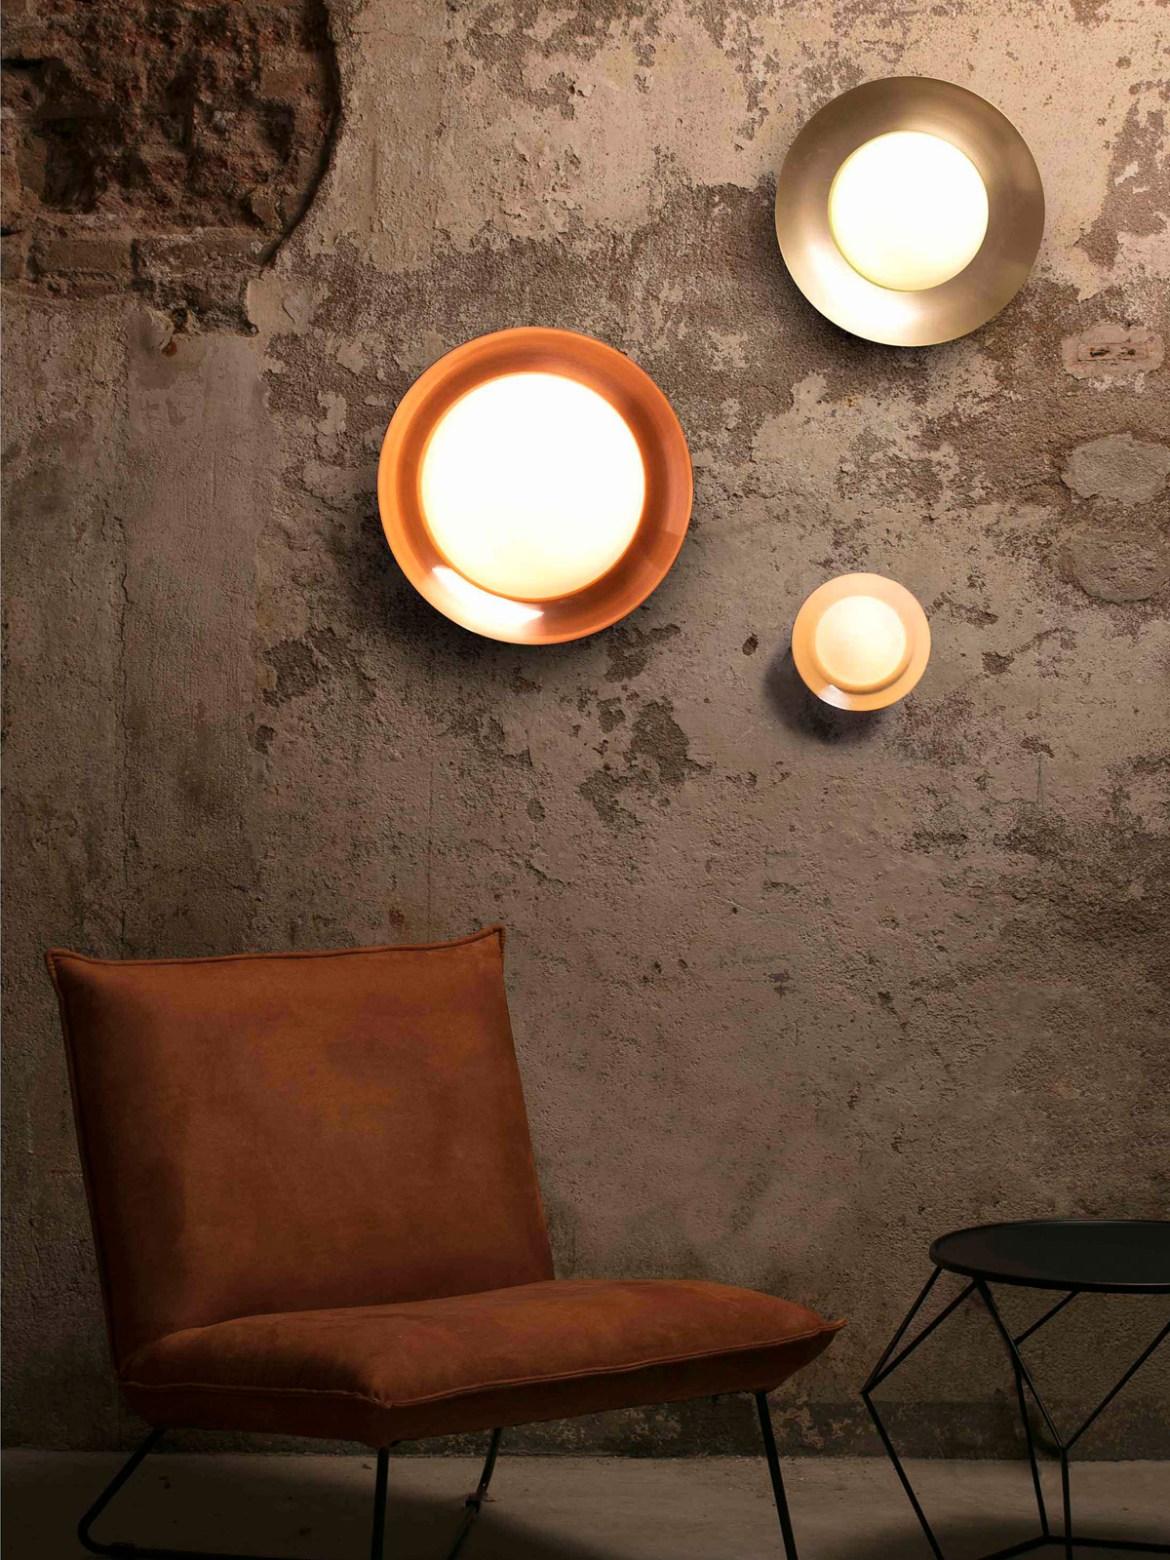 DesignOrt Blog: Neue Designerlampen bei DesignOrt LED Wandlampe Side Faro Barcelona